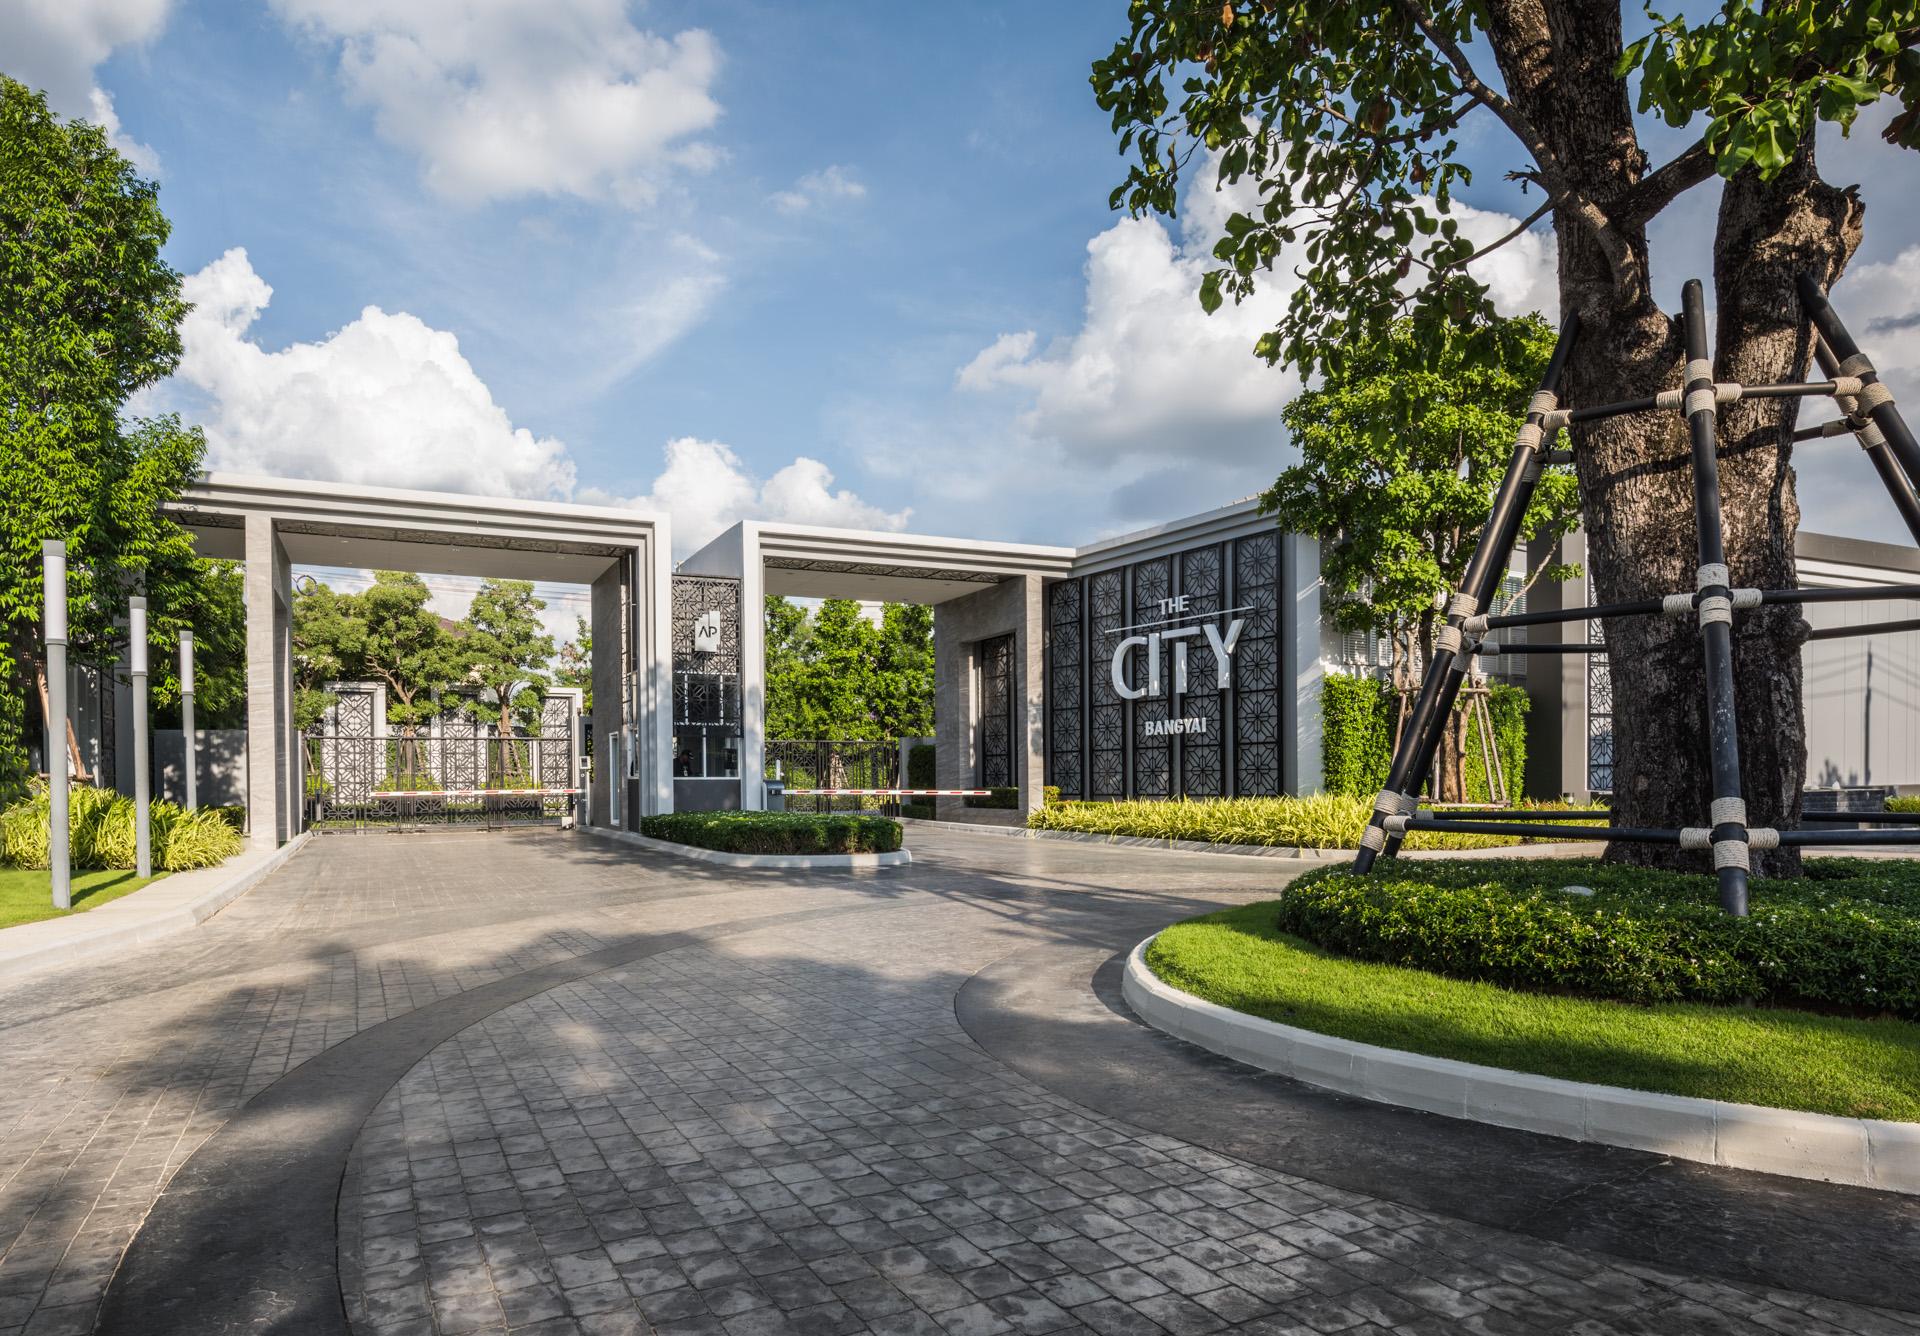 The City Bangyai